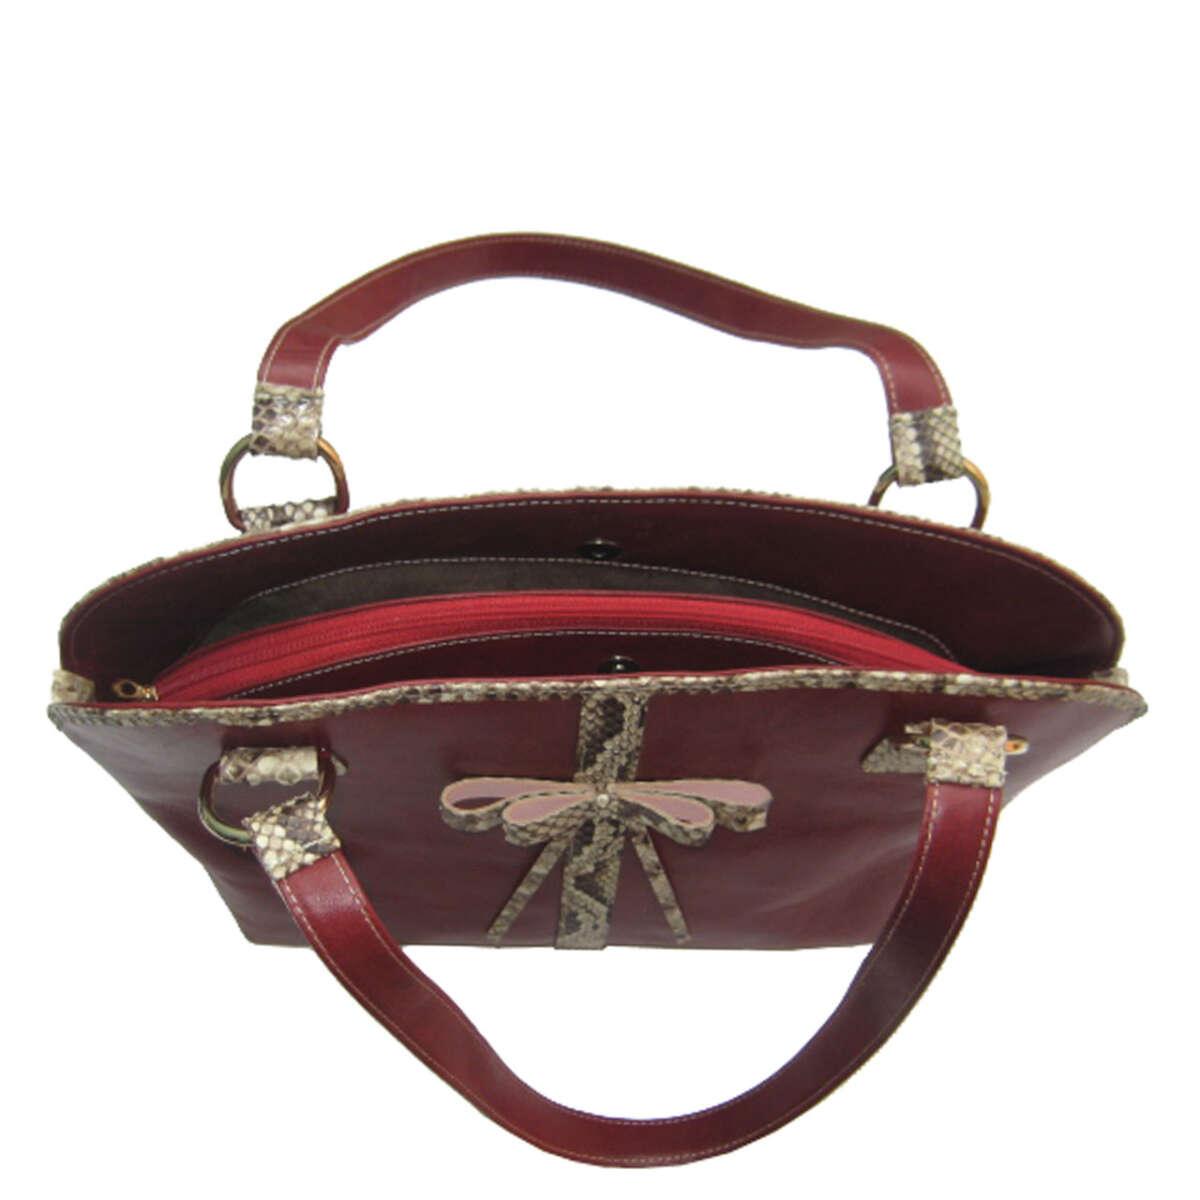 Túi xách nữ da bò phối da trăn B007b